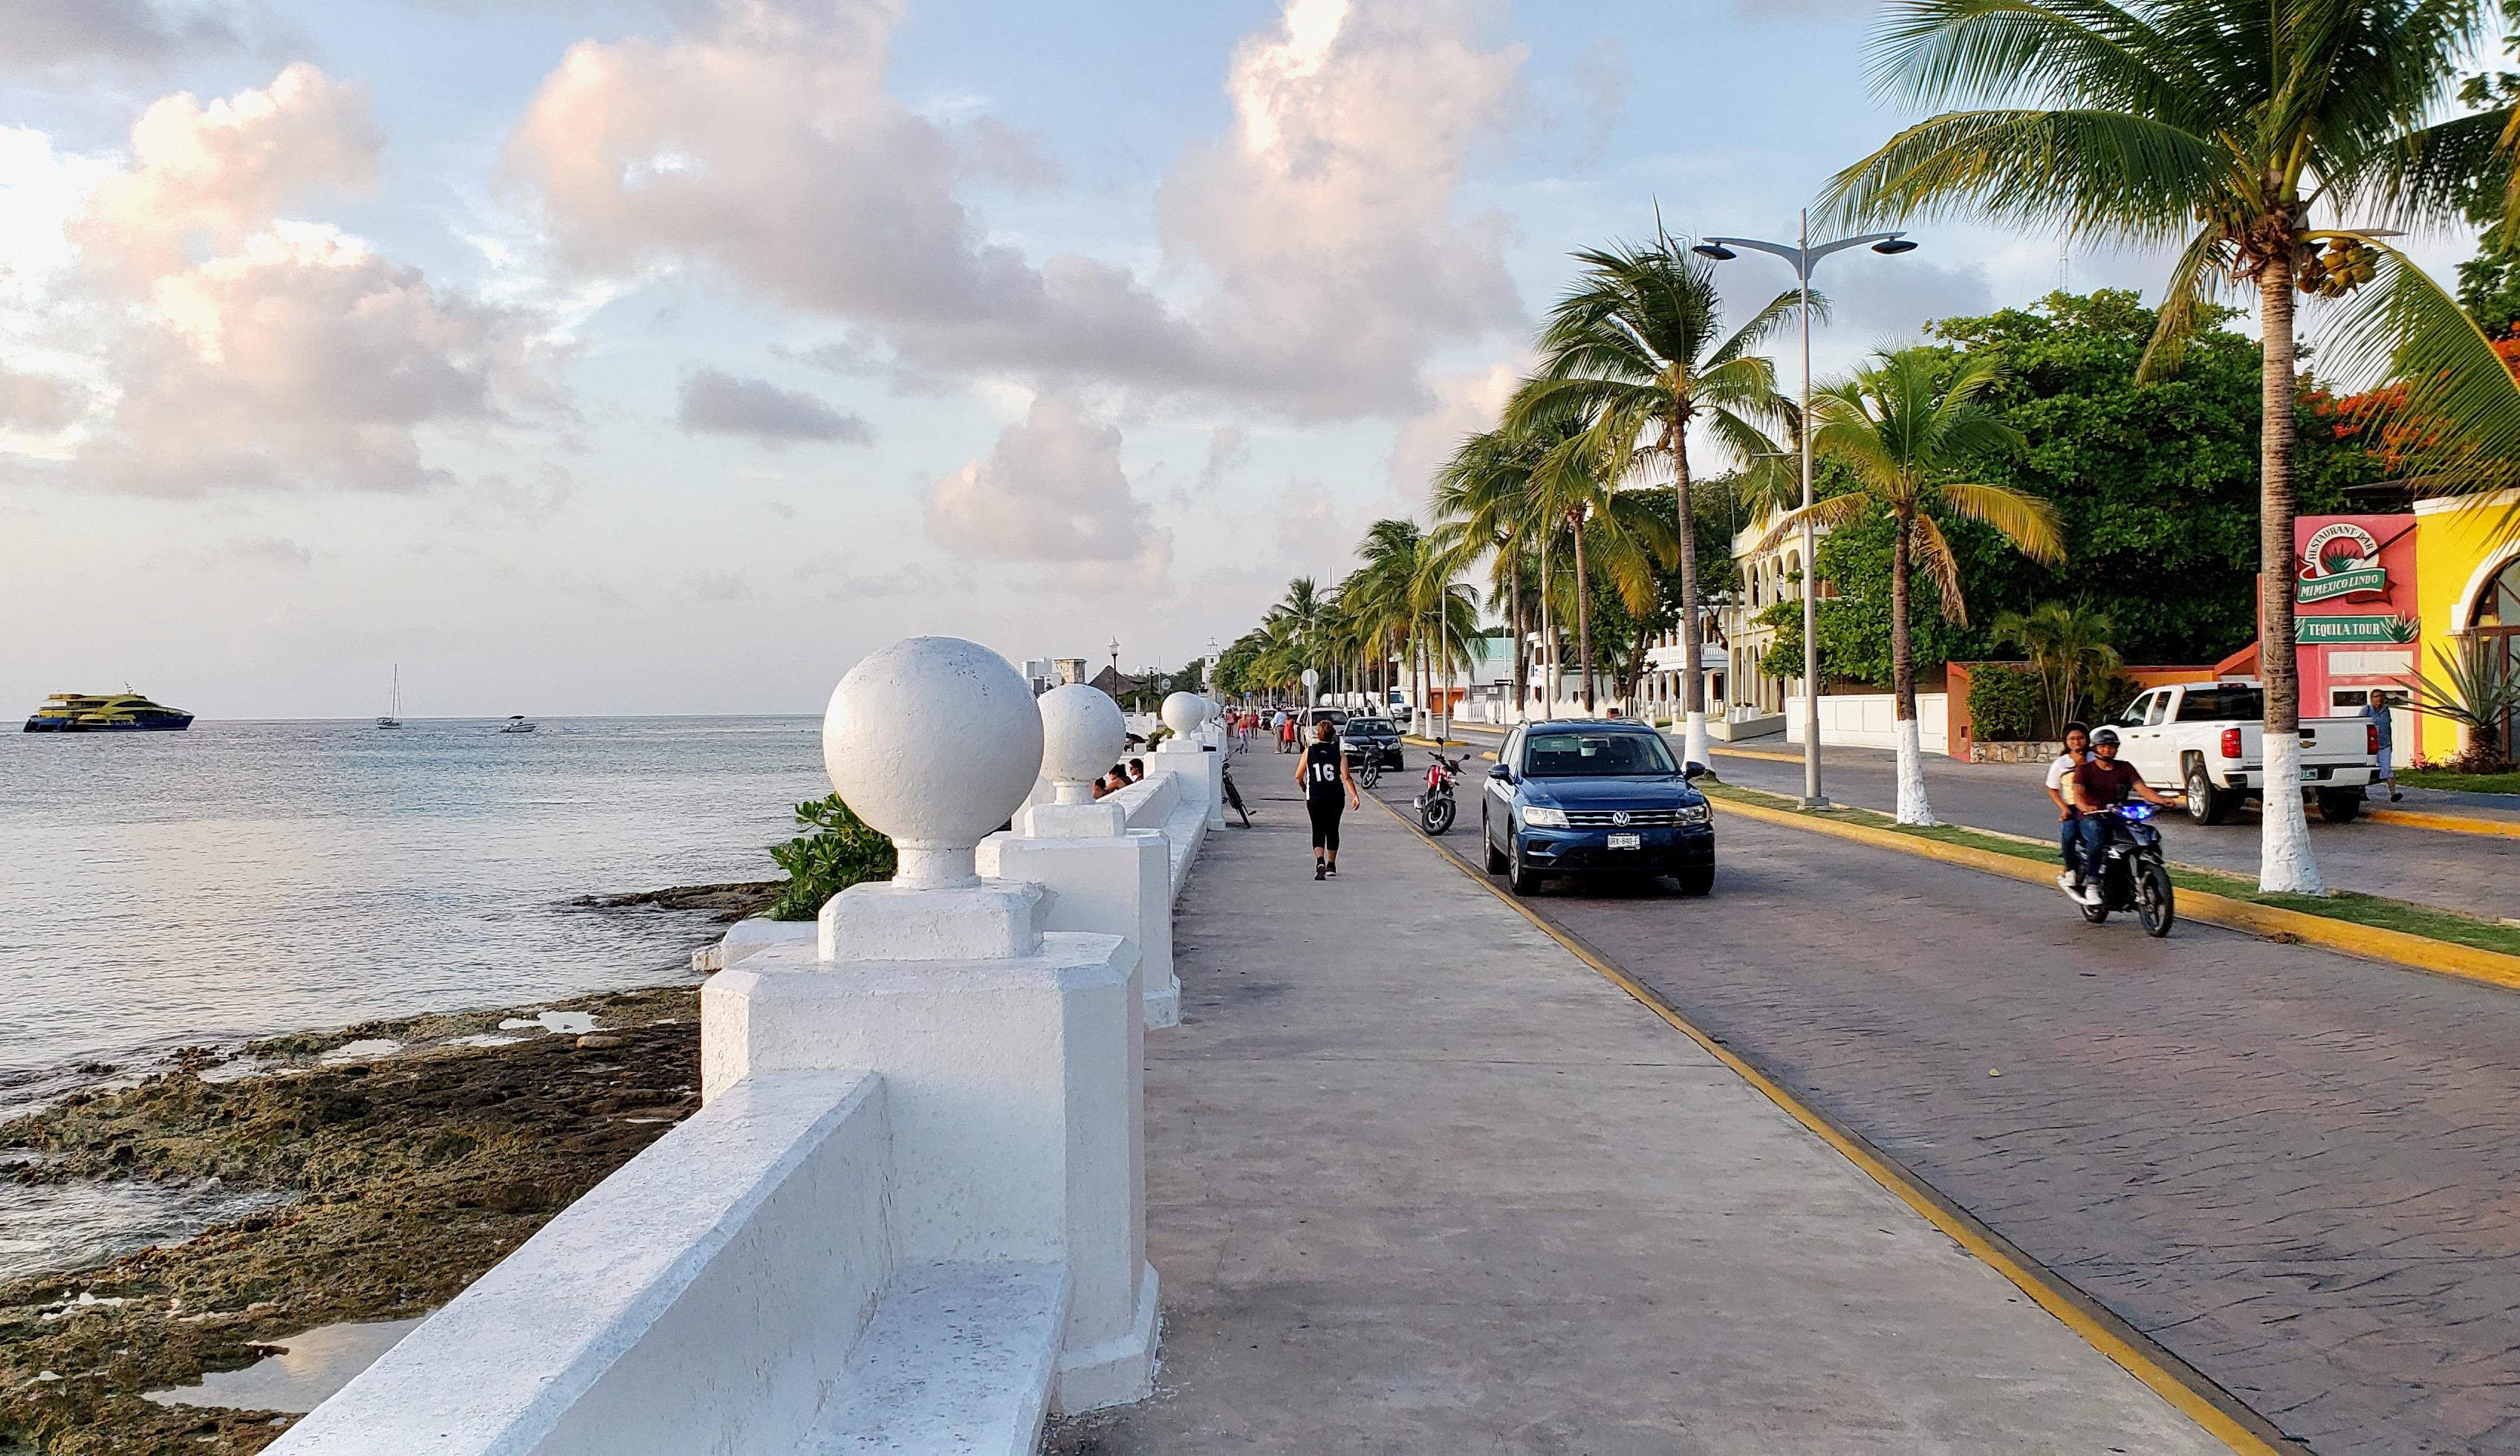 Cozumel, Mexico Travel Guide 2021 / Traveling Lamas / photo by@travelinglamas